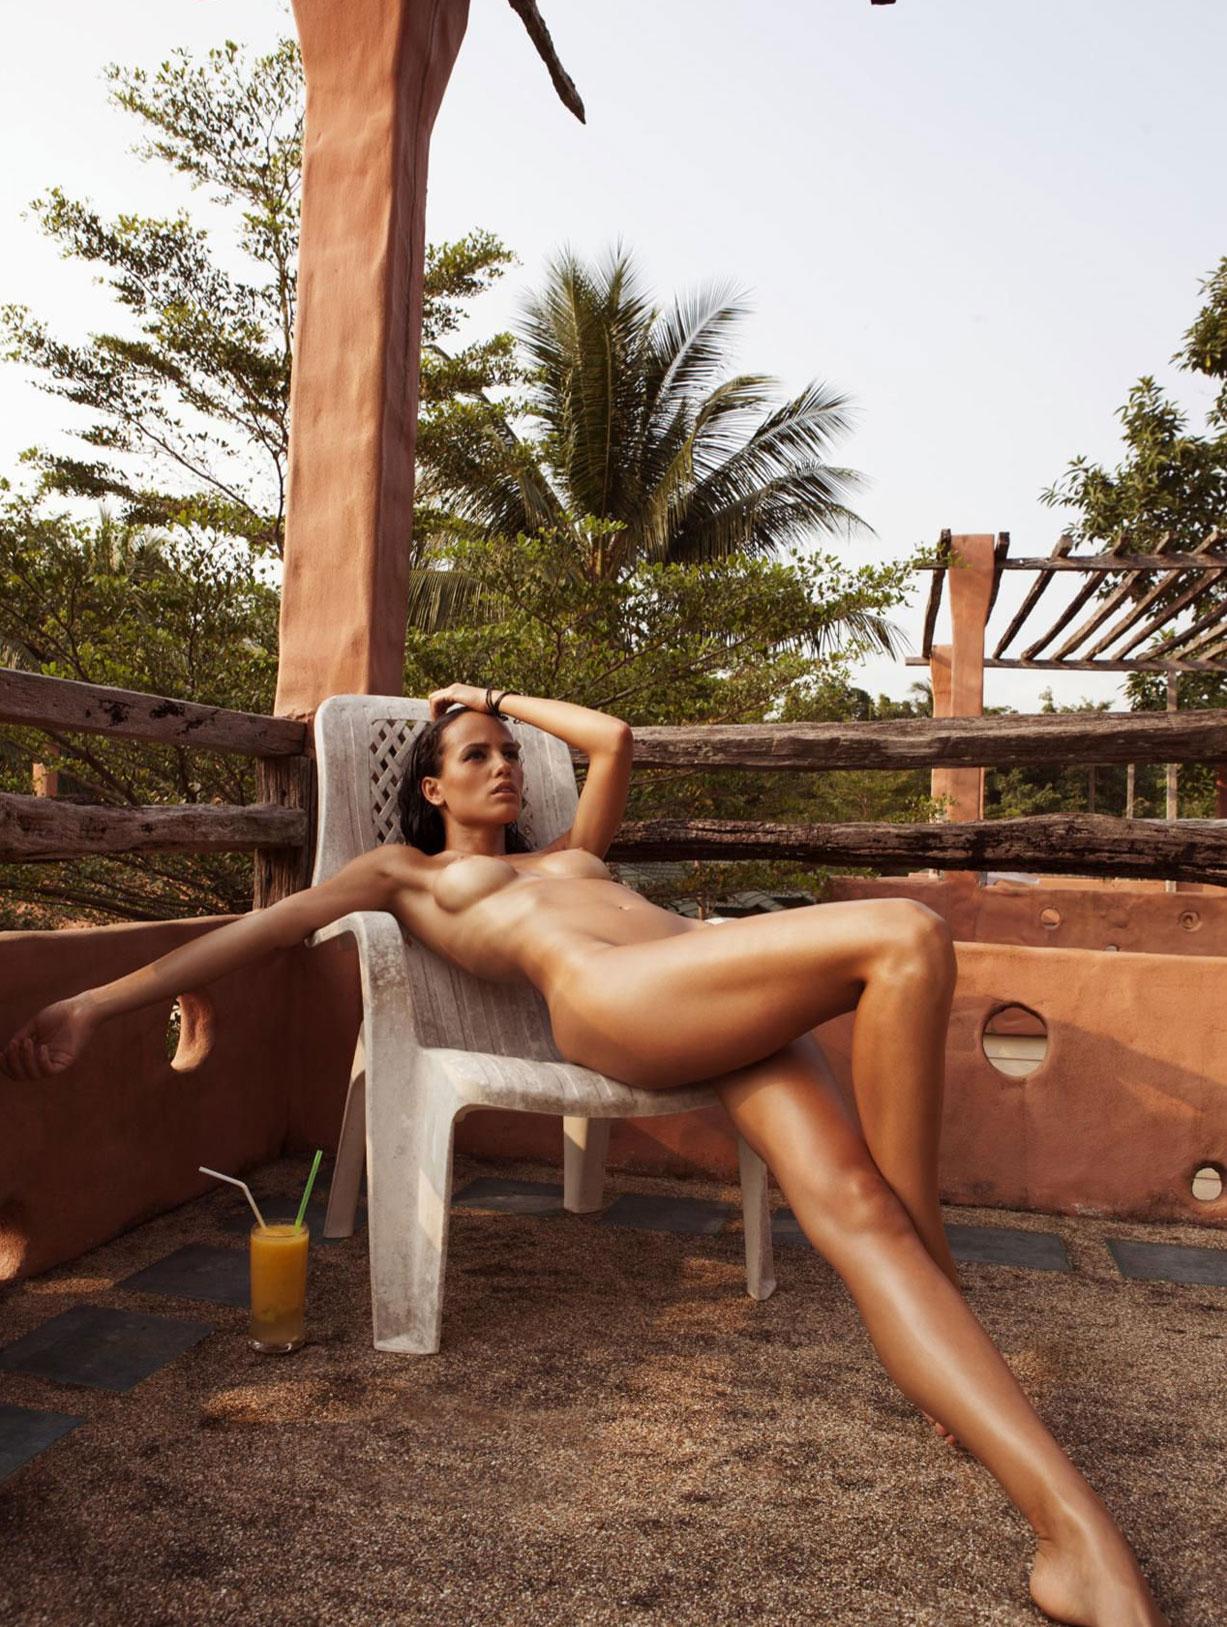 Девушка месяца Ирина Бондаренко / Iryna Bondarenko - Playboy Netheralnd / Poland / Ukraine